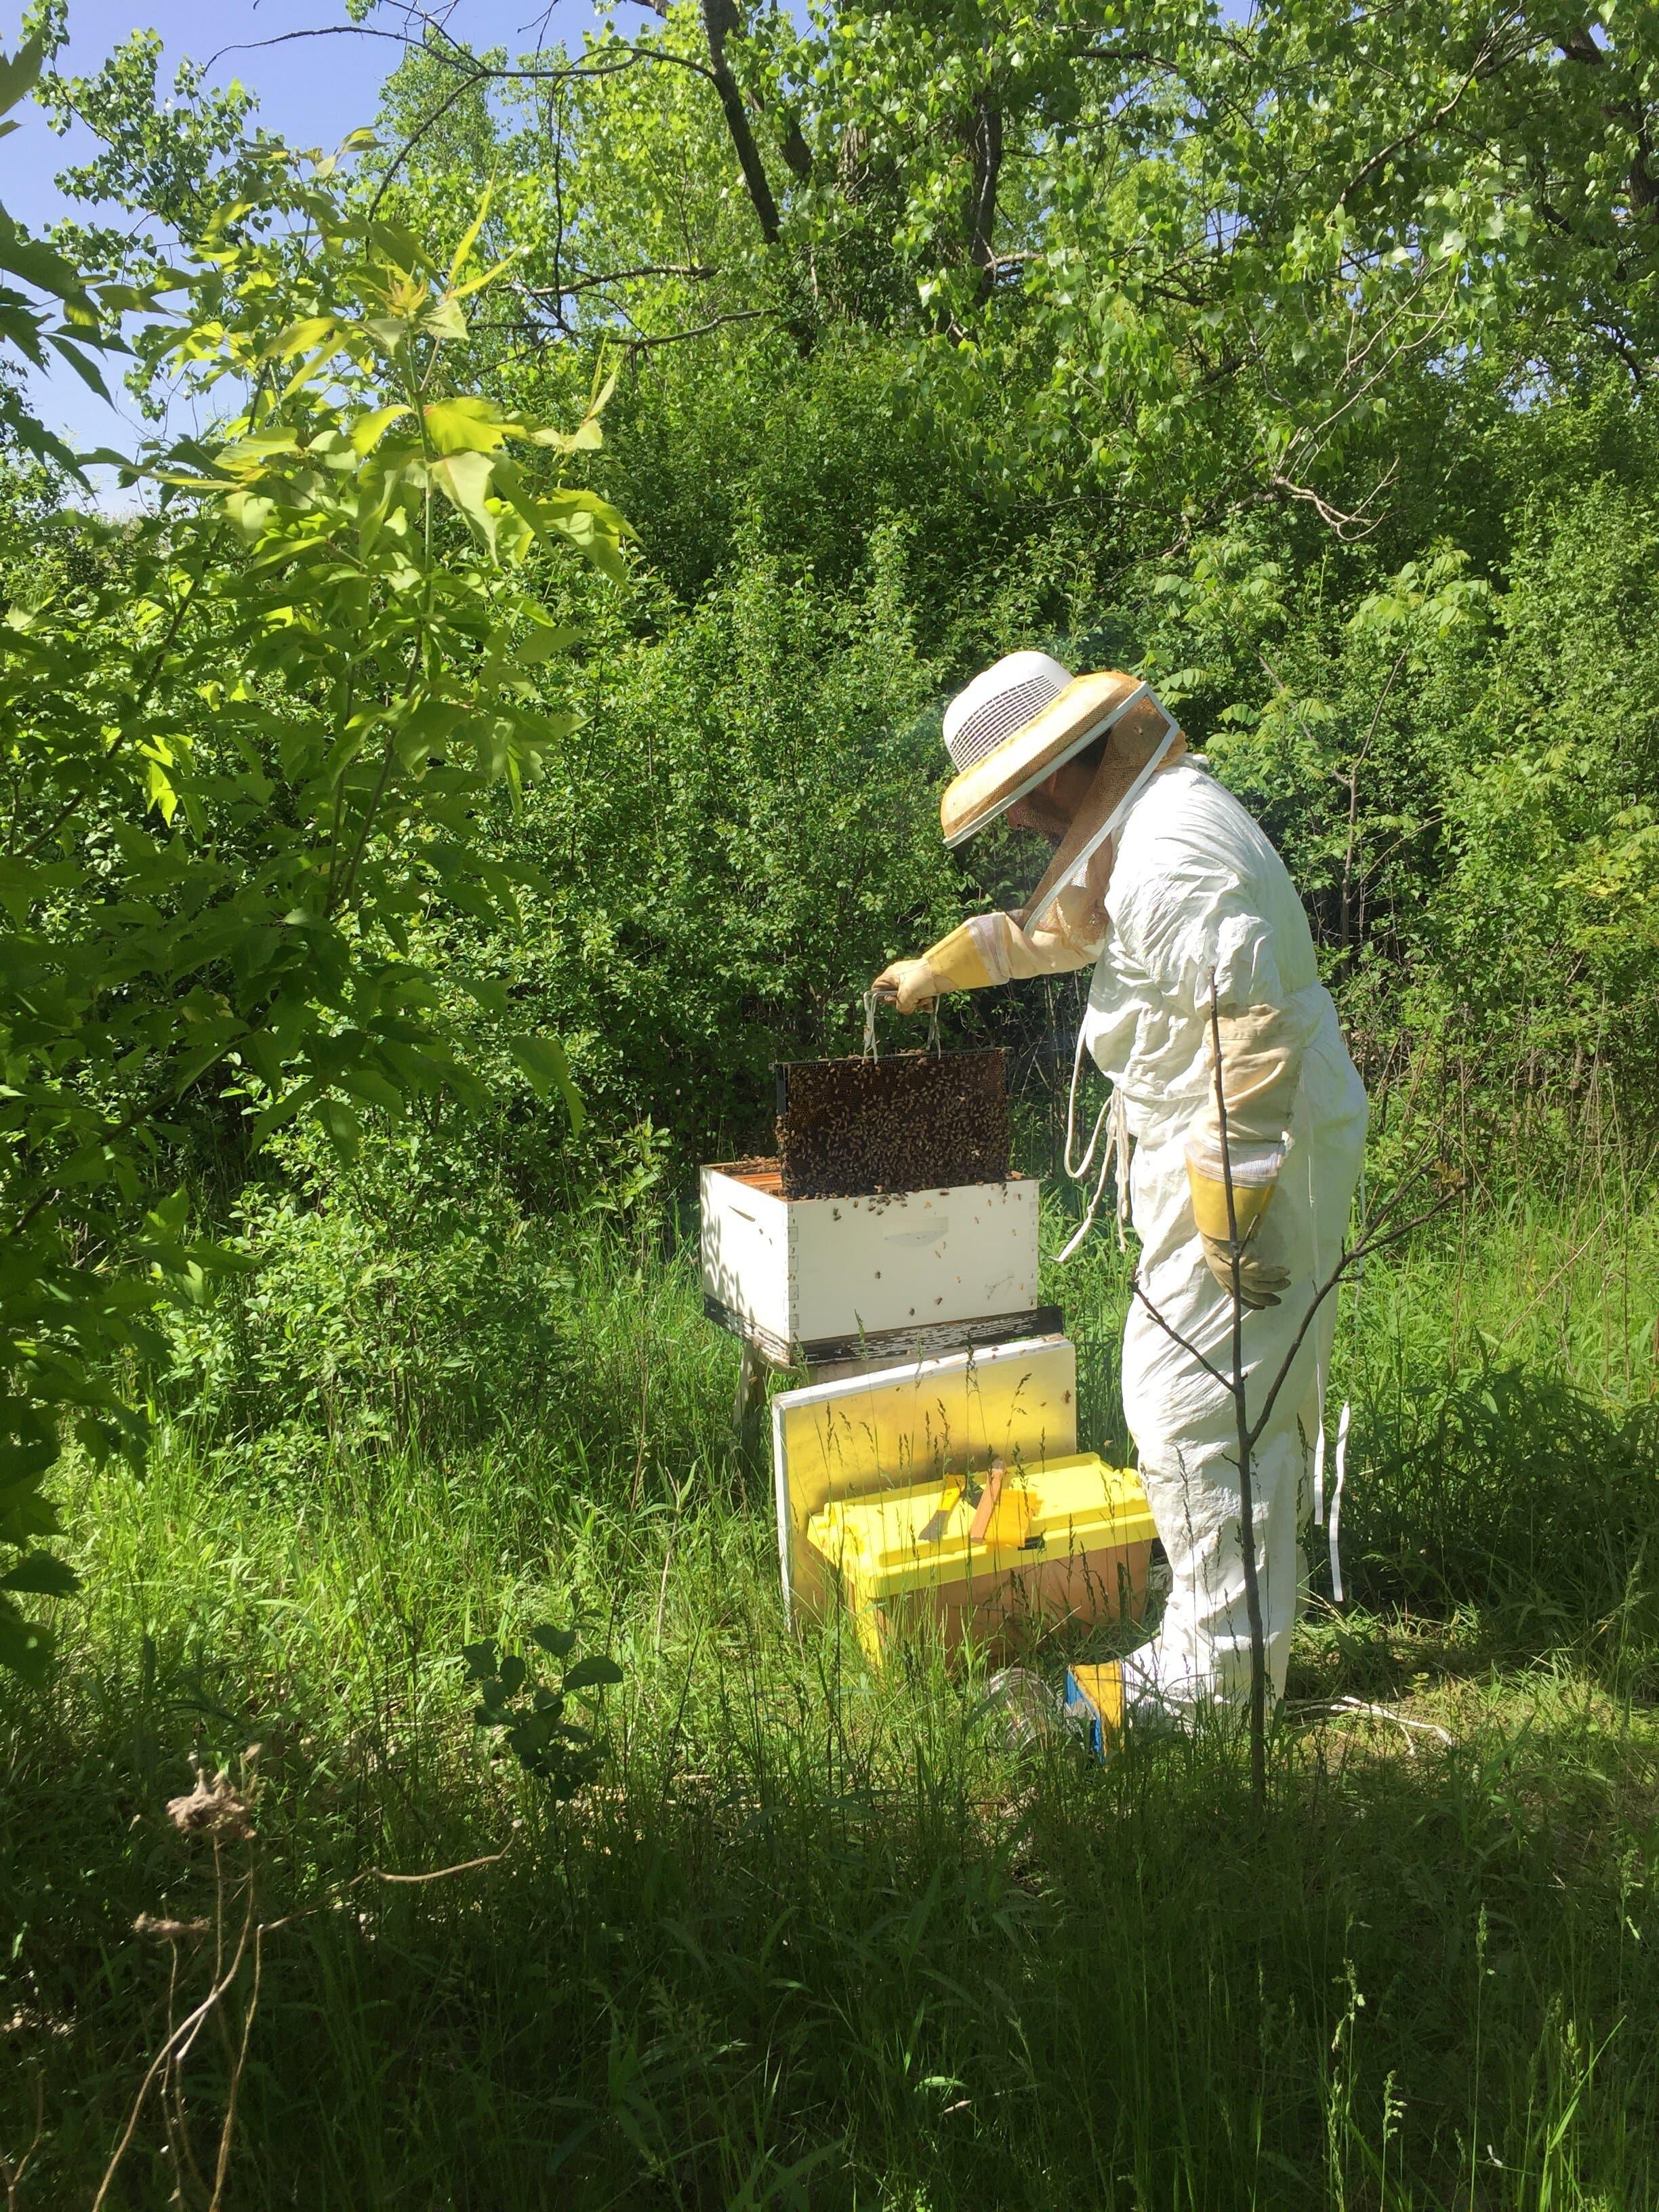 PSC's New Beehive